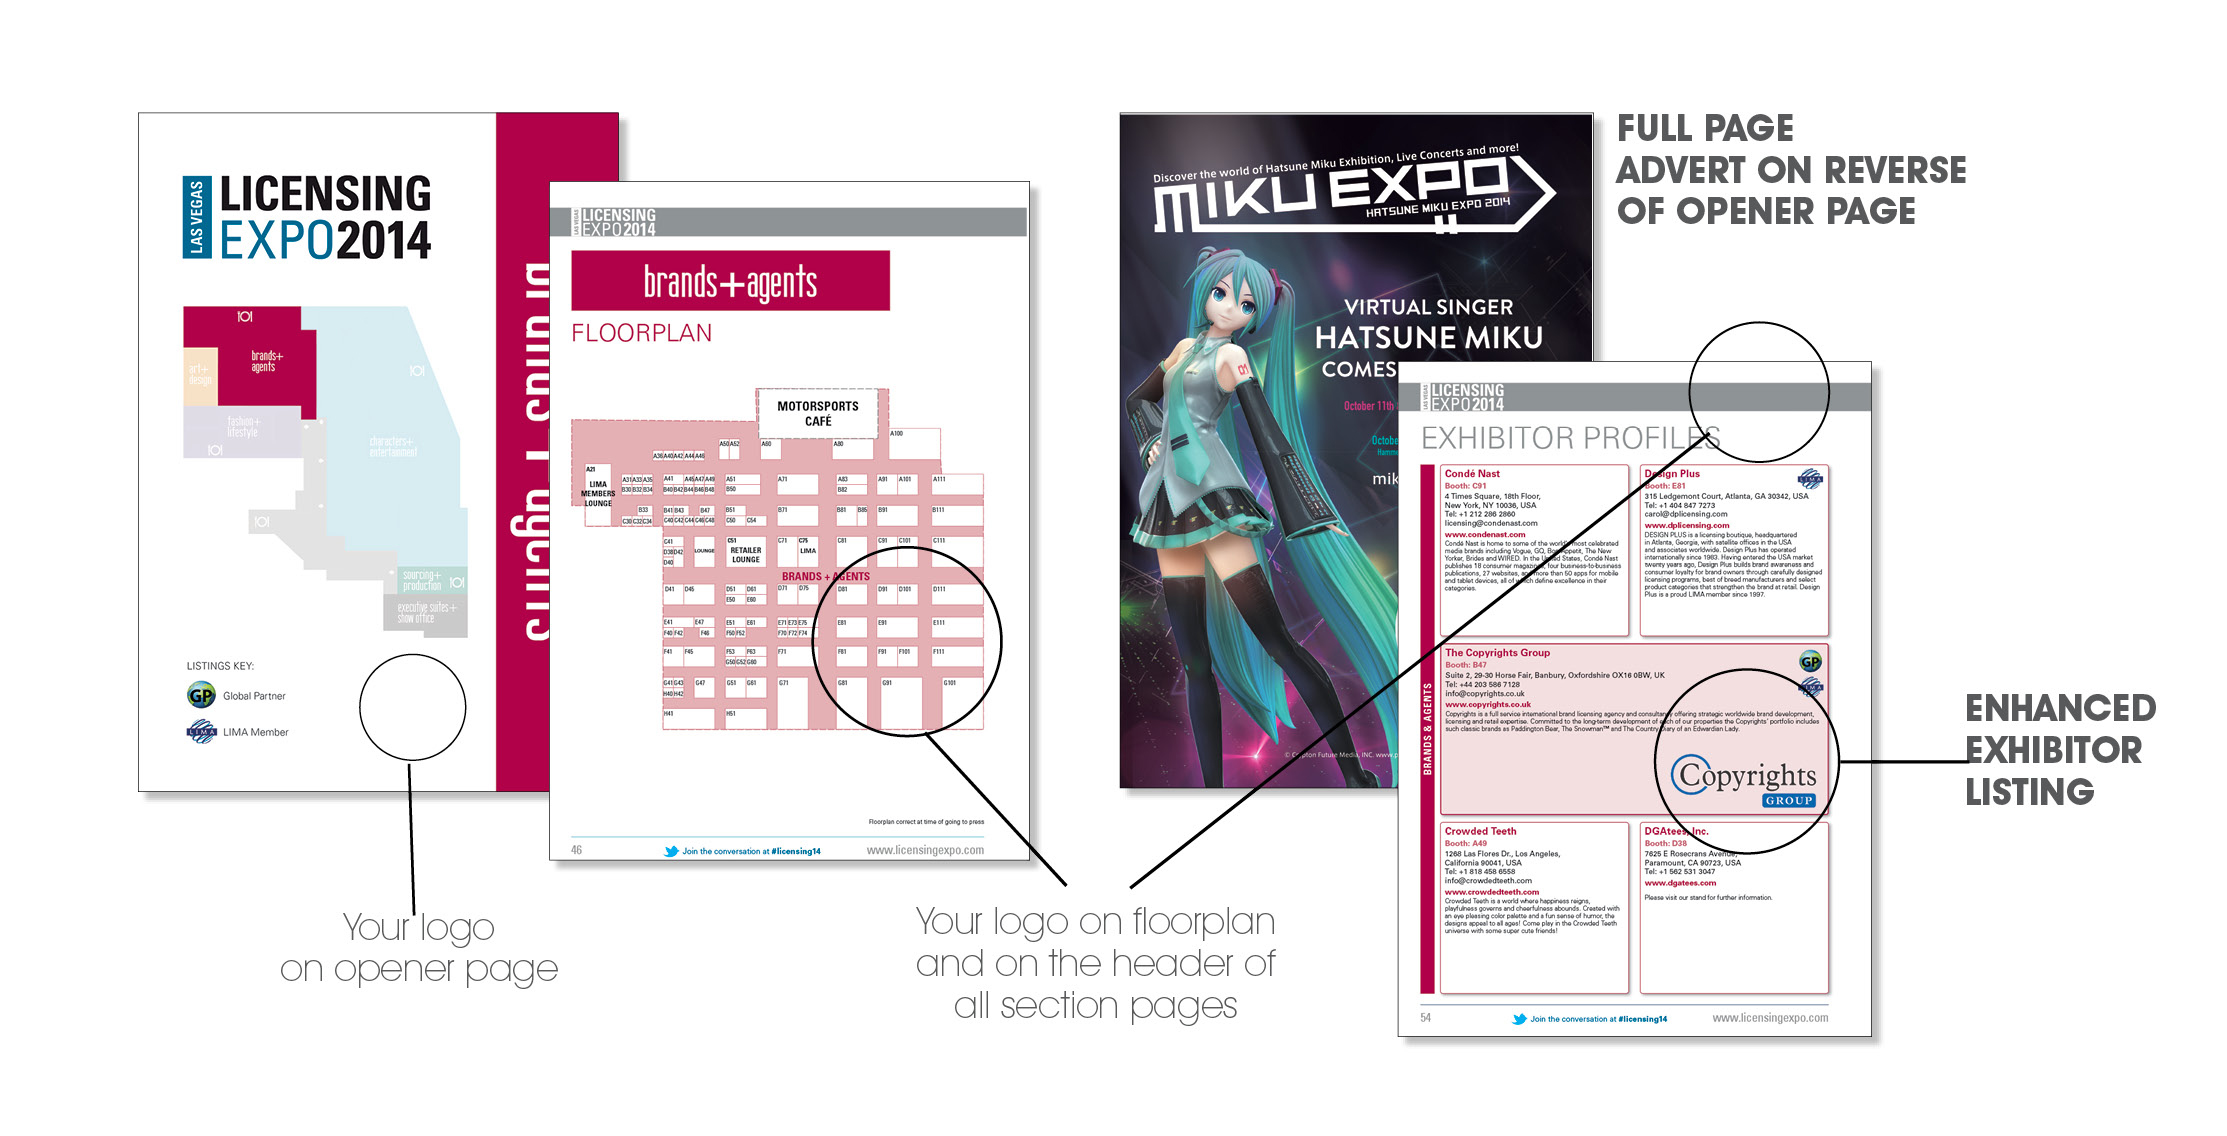 Gold Package Licensing Expo.jpg